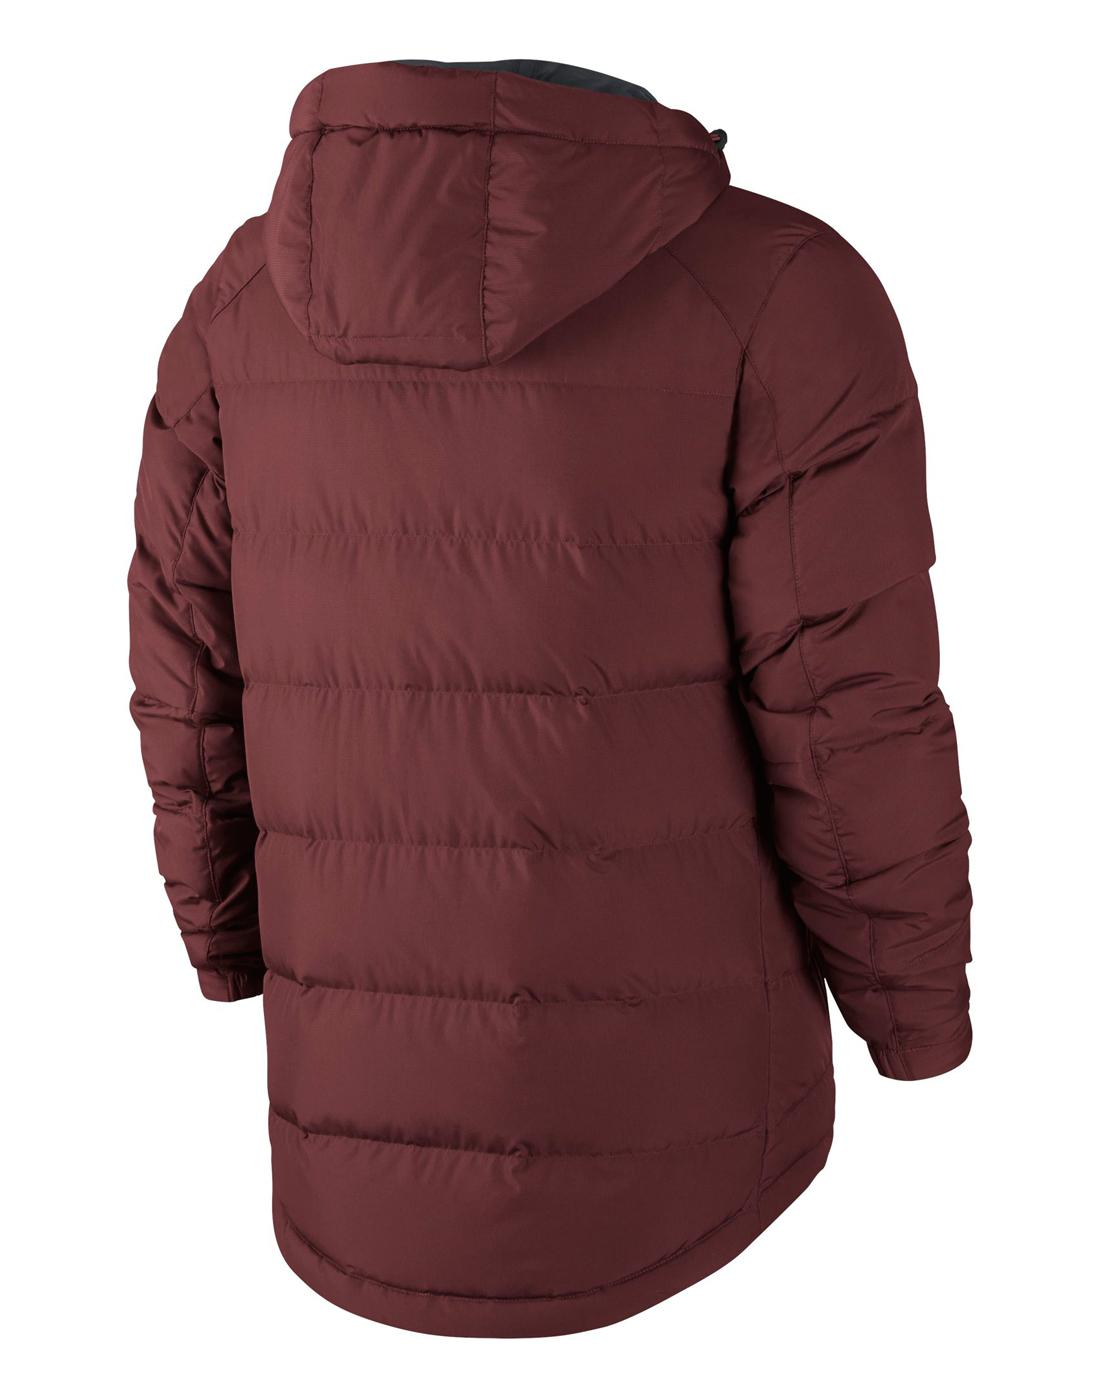 68eb3226c036 Mens Down Filled Hooded Jacket · Mens Down Filled Hooded Jacket